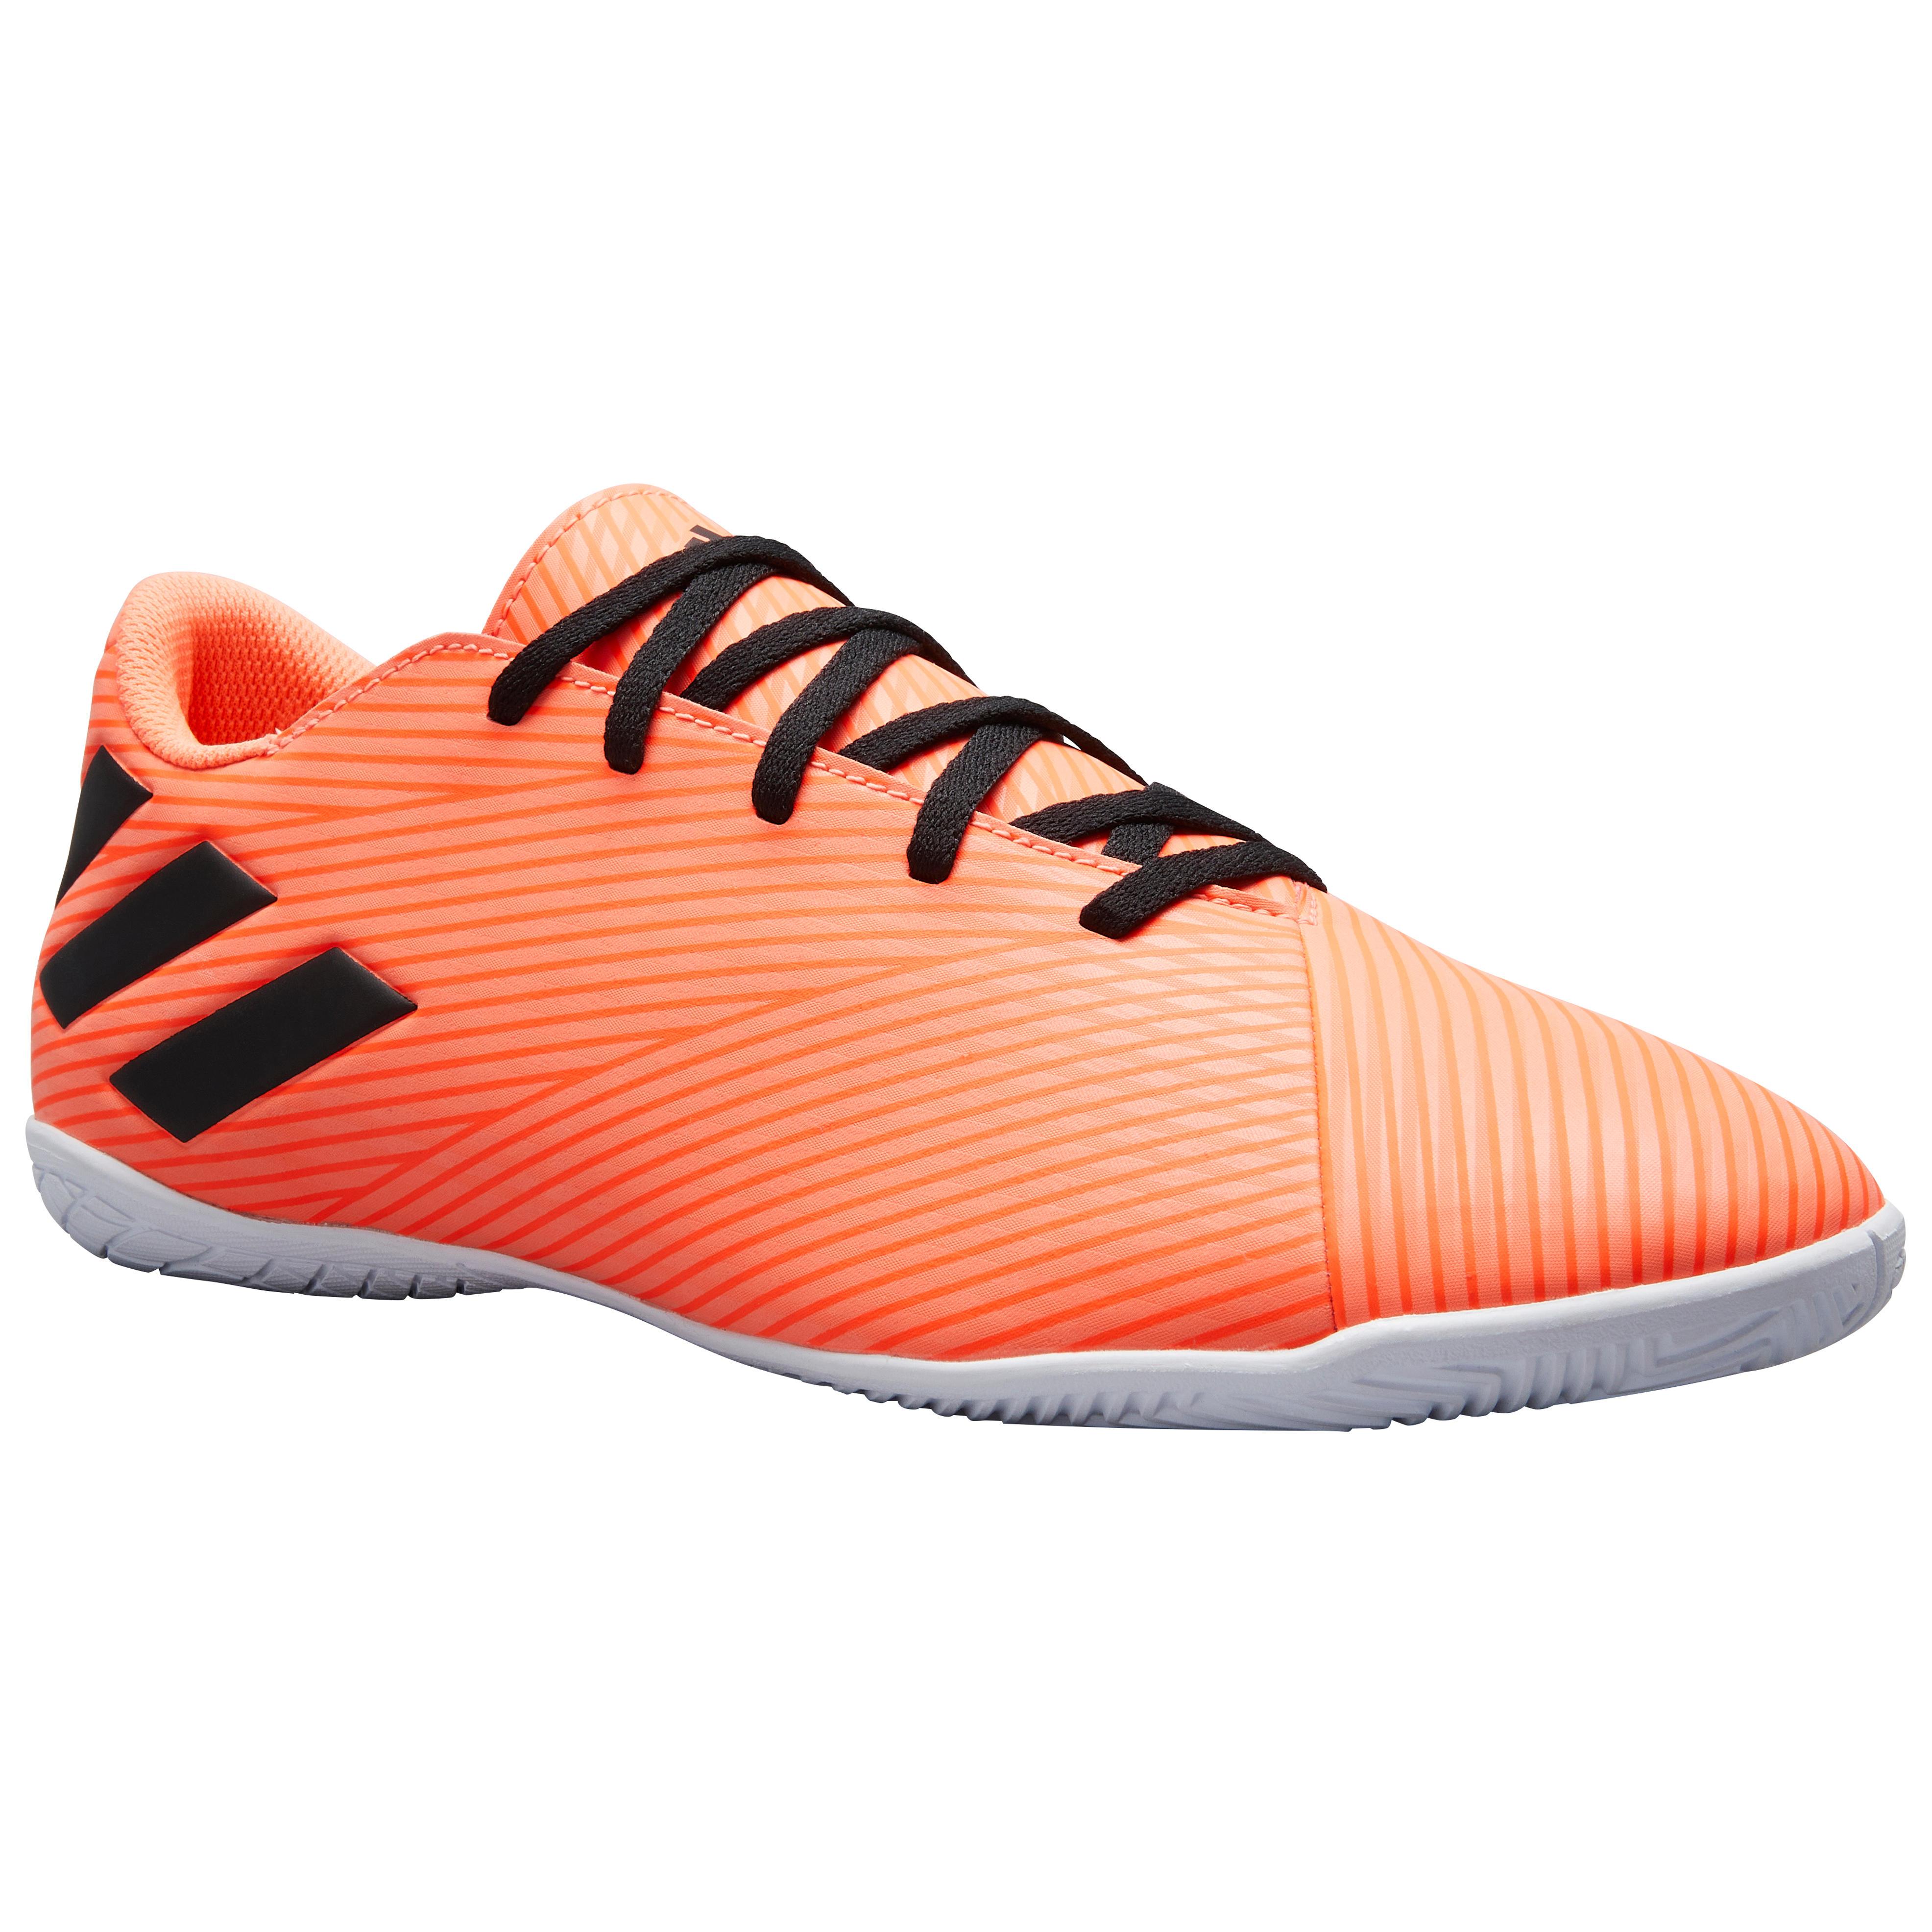 lavabo defensa Querido  Zapatillas de fútbol sala NEMEZIZ 4 naranja negro ADIDAS | Decathlon